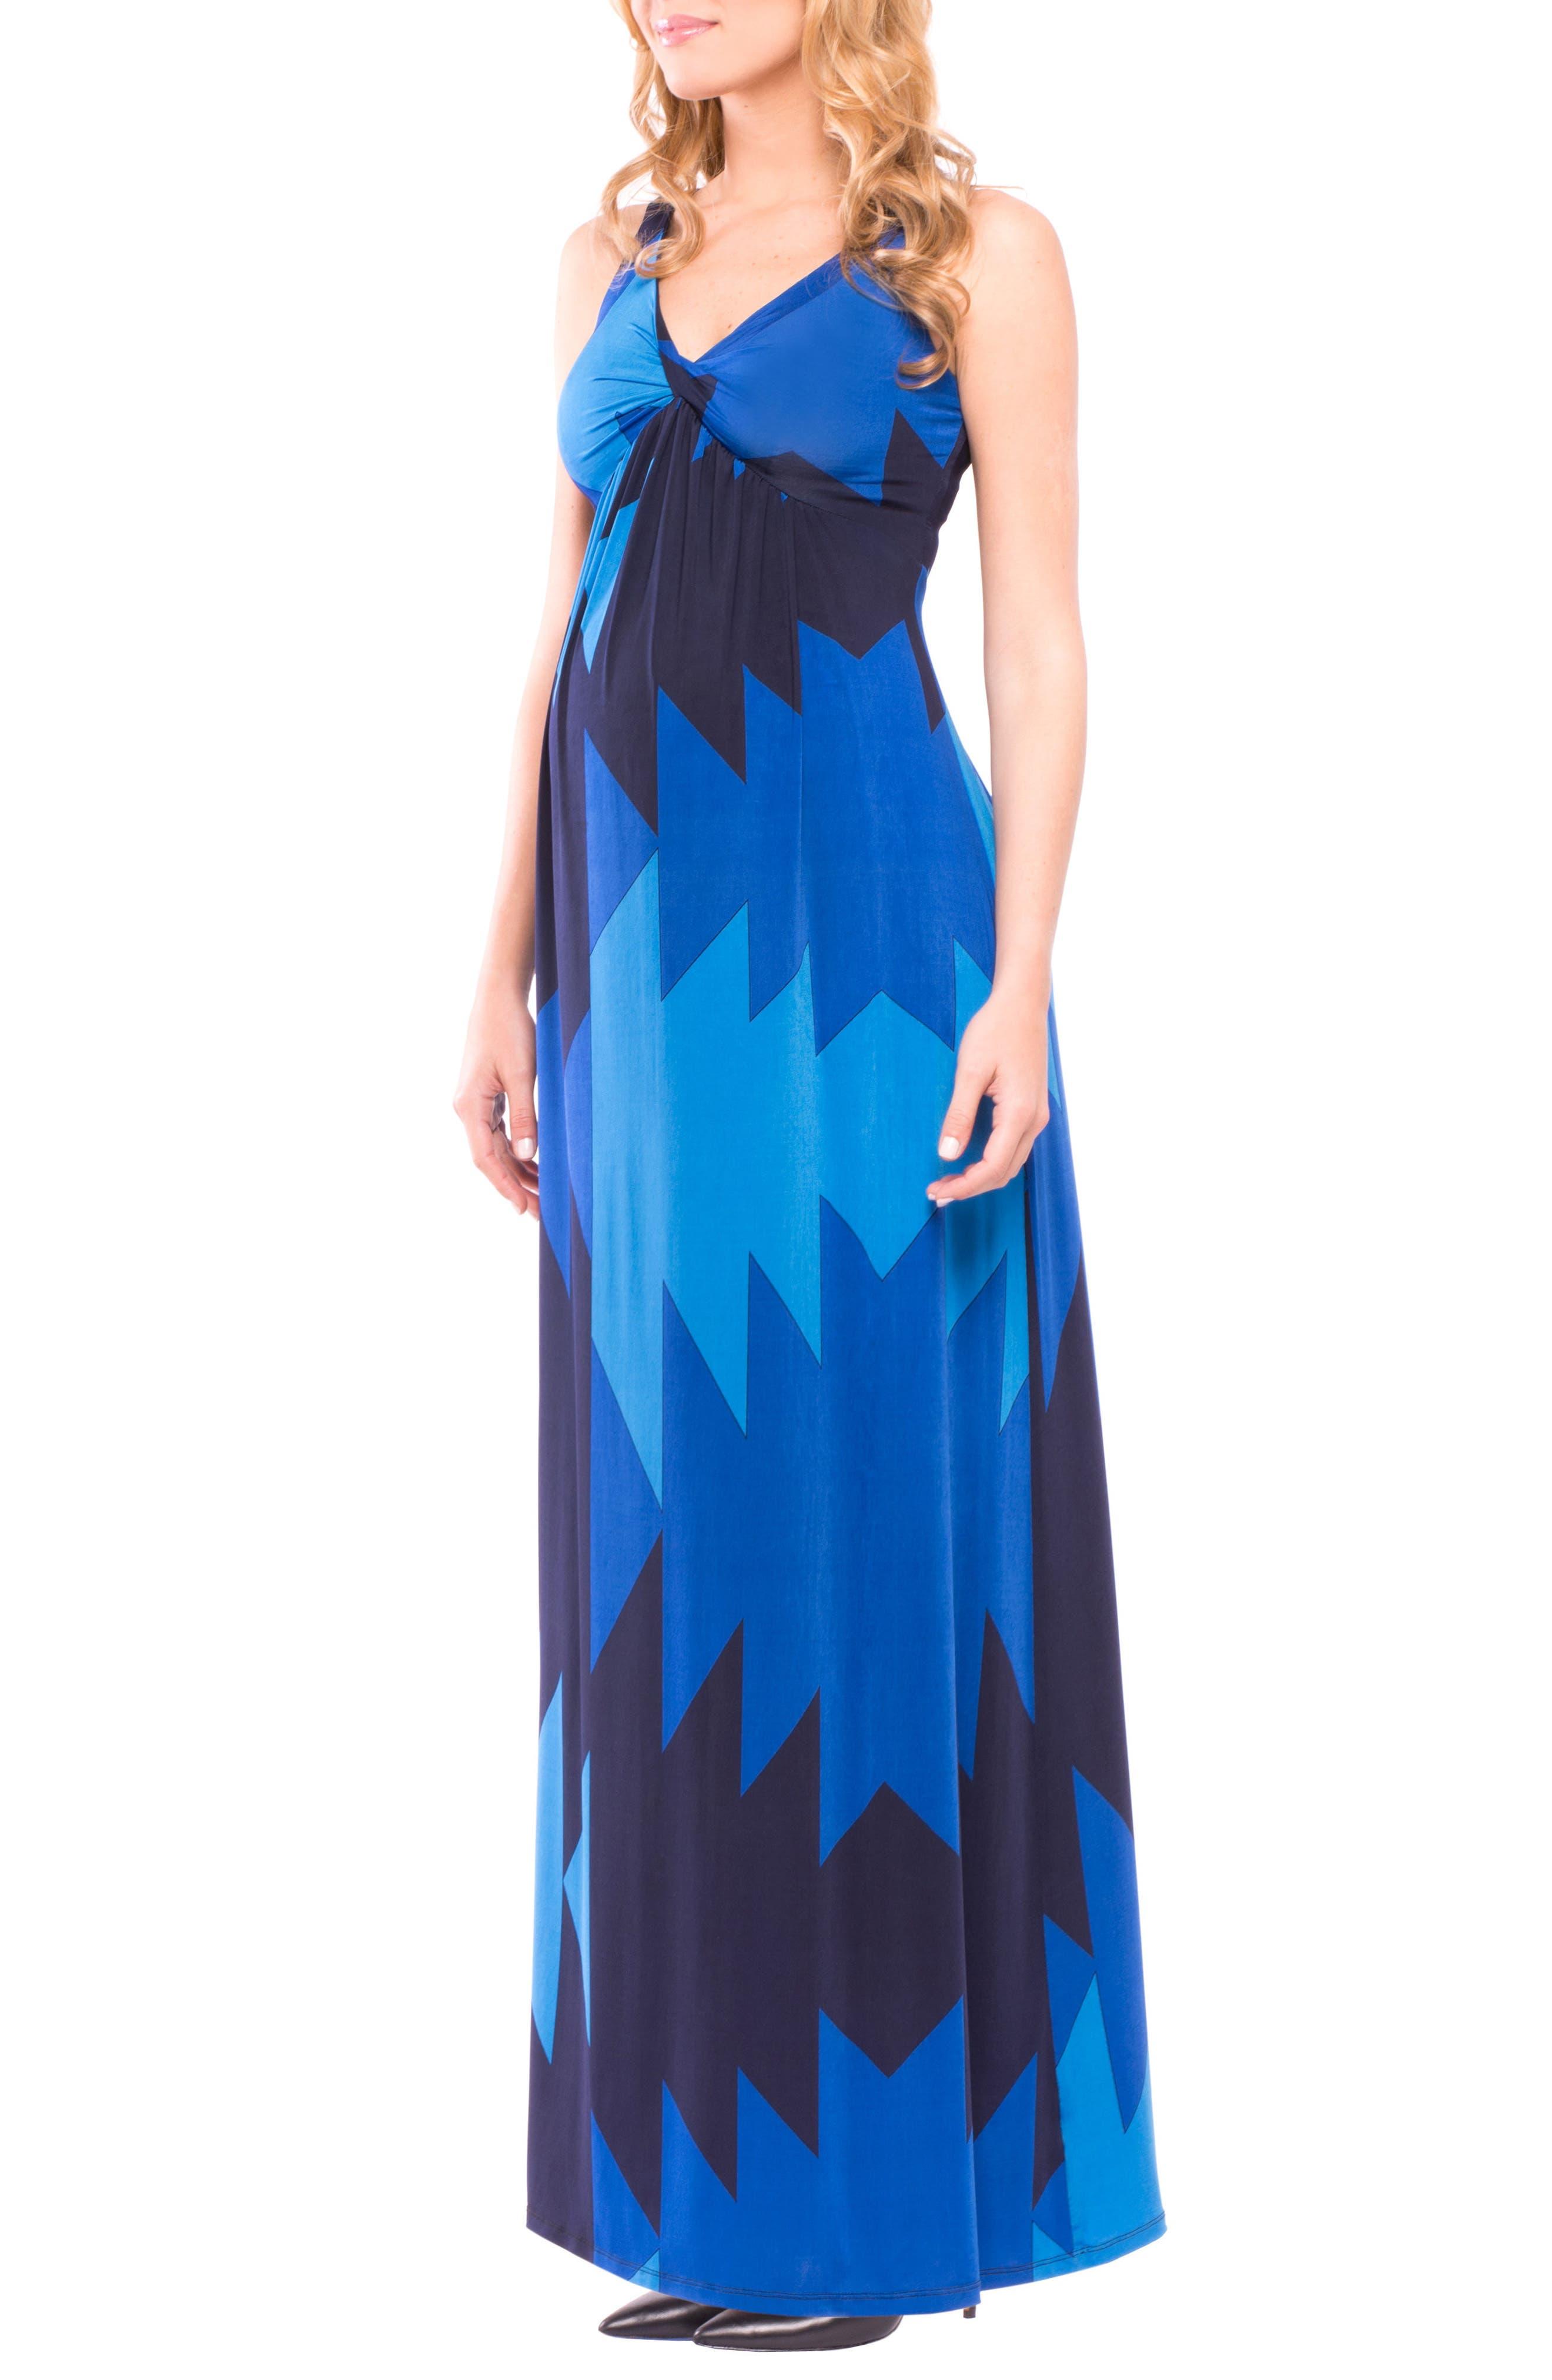 Olivia Sleeveless Maternity Maxi Dress,                             Alternate thumbnail 5, color,                             BLUE AZTEC PRINT